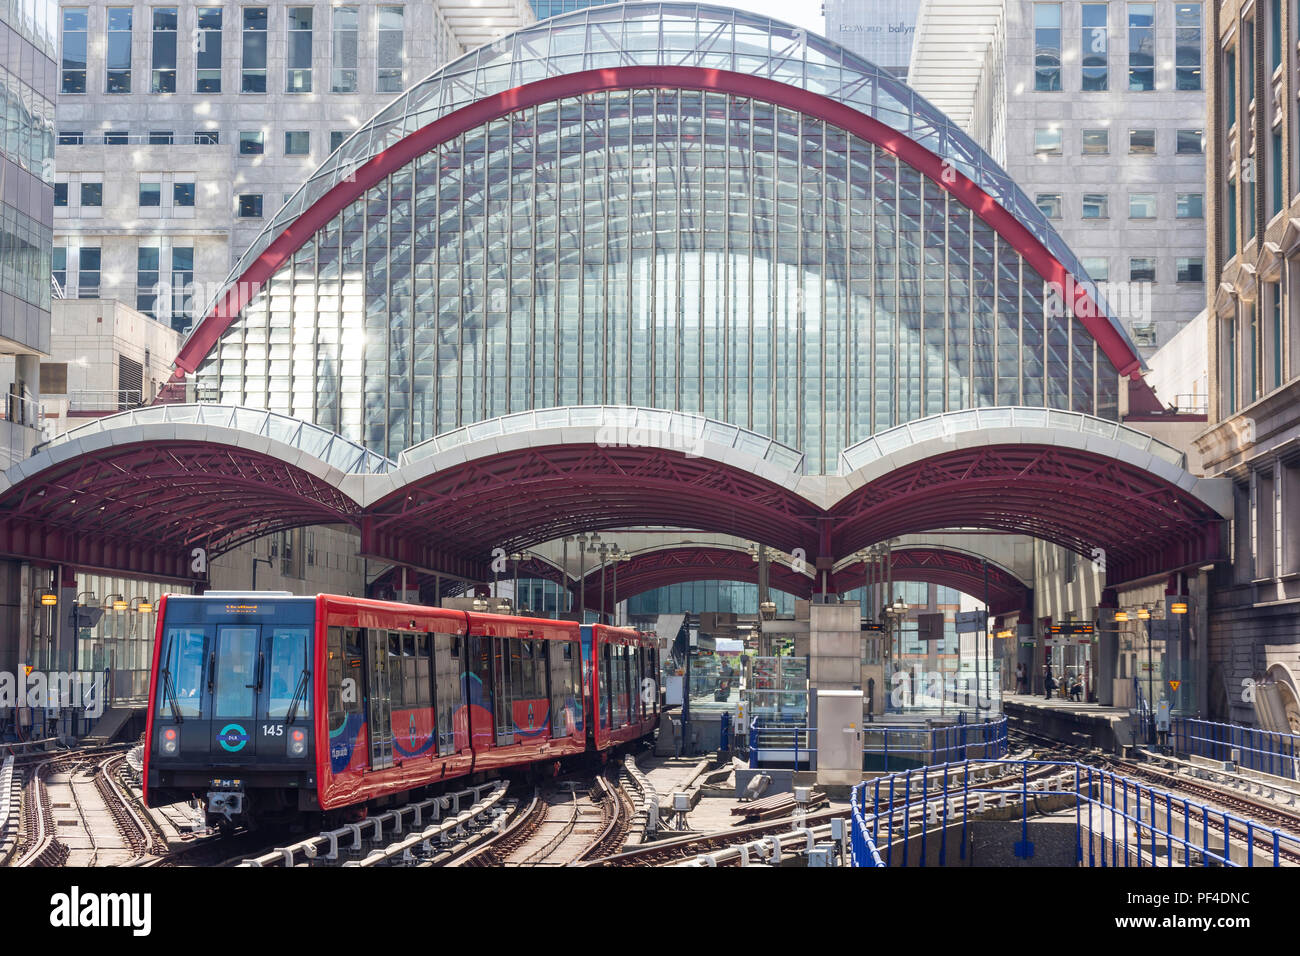 Canary Wharf DLR station, Canary Wharf, London Borough of Tower Hamlets, Greater London, England, United Kingdom - Stock Image